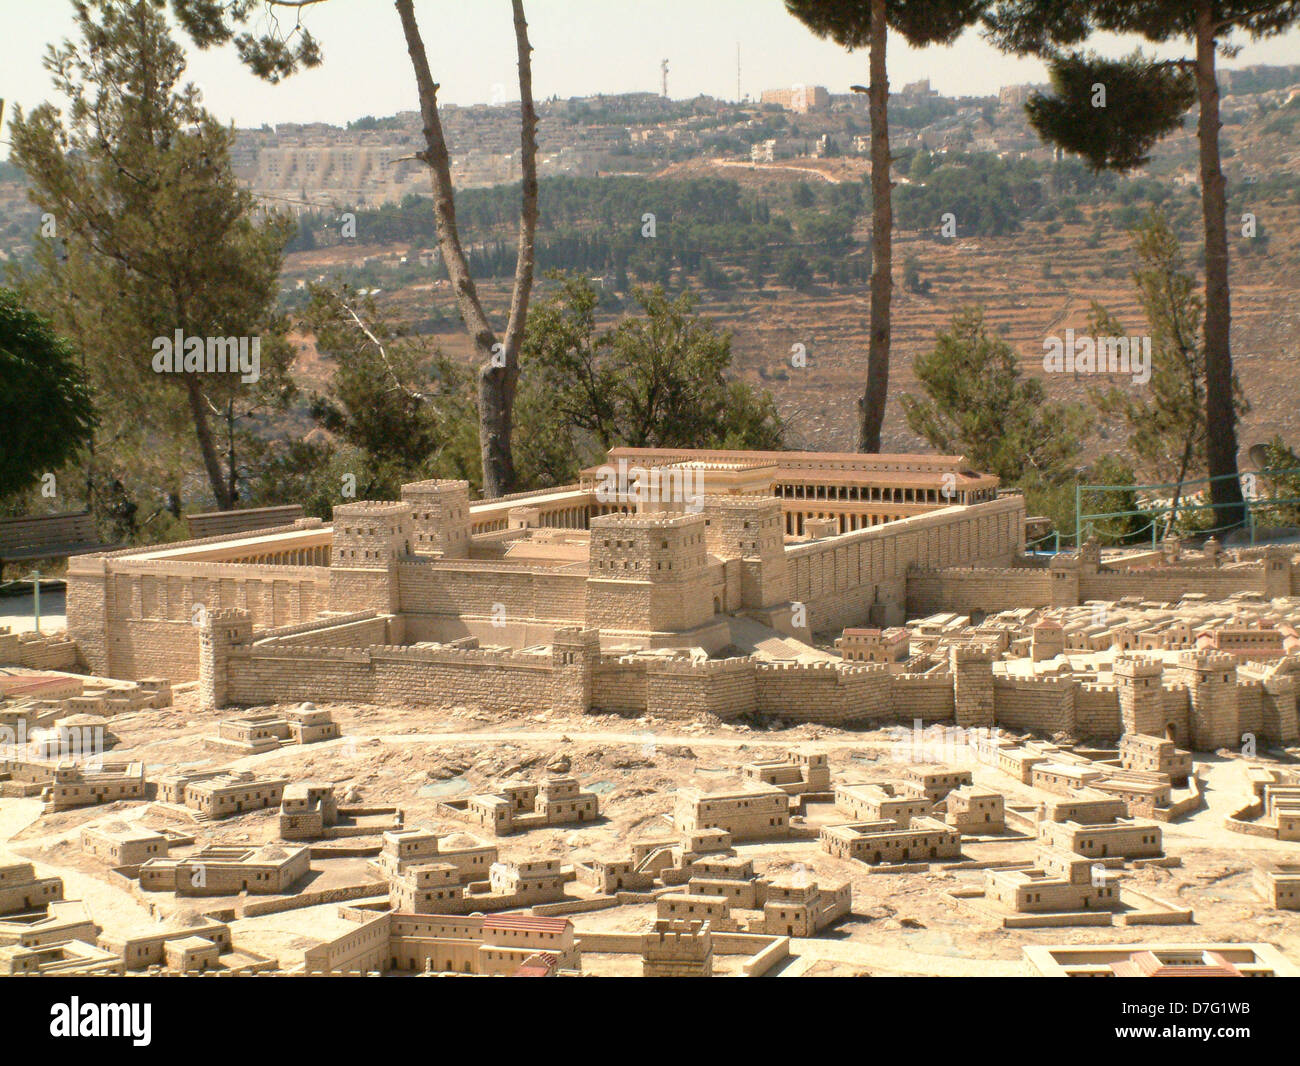 holyland model of ancient jerusalem - Stock Image